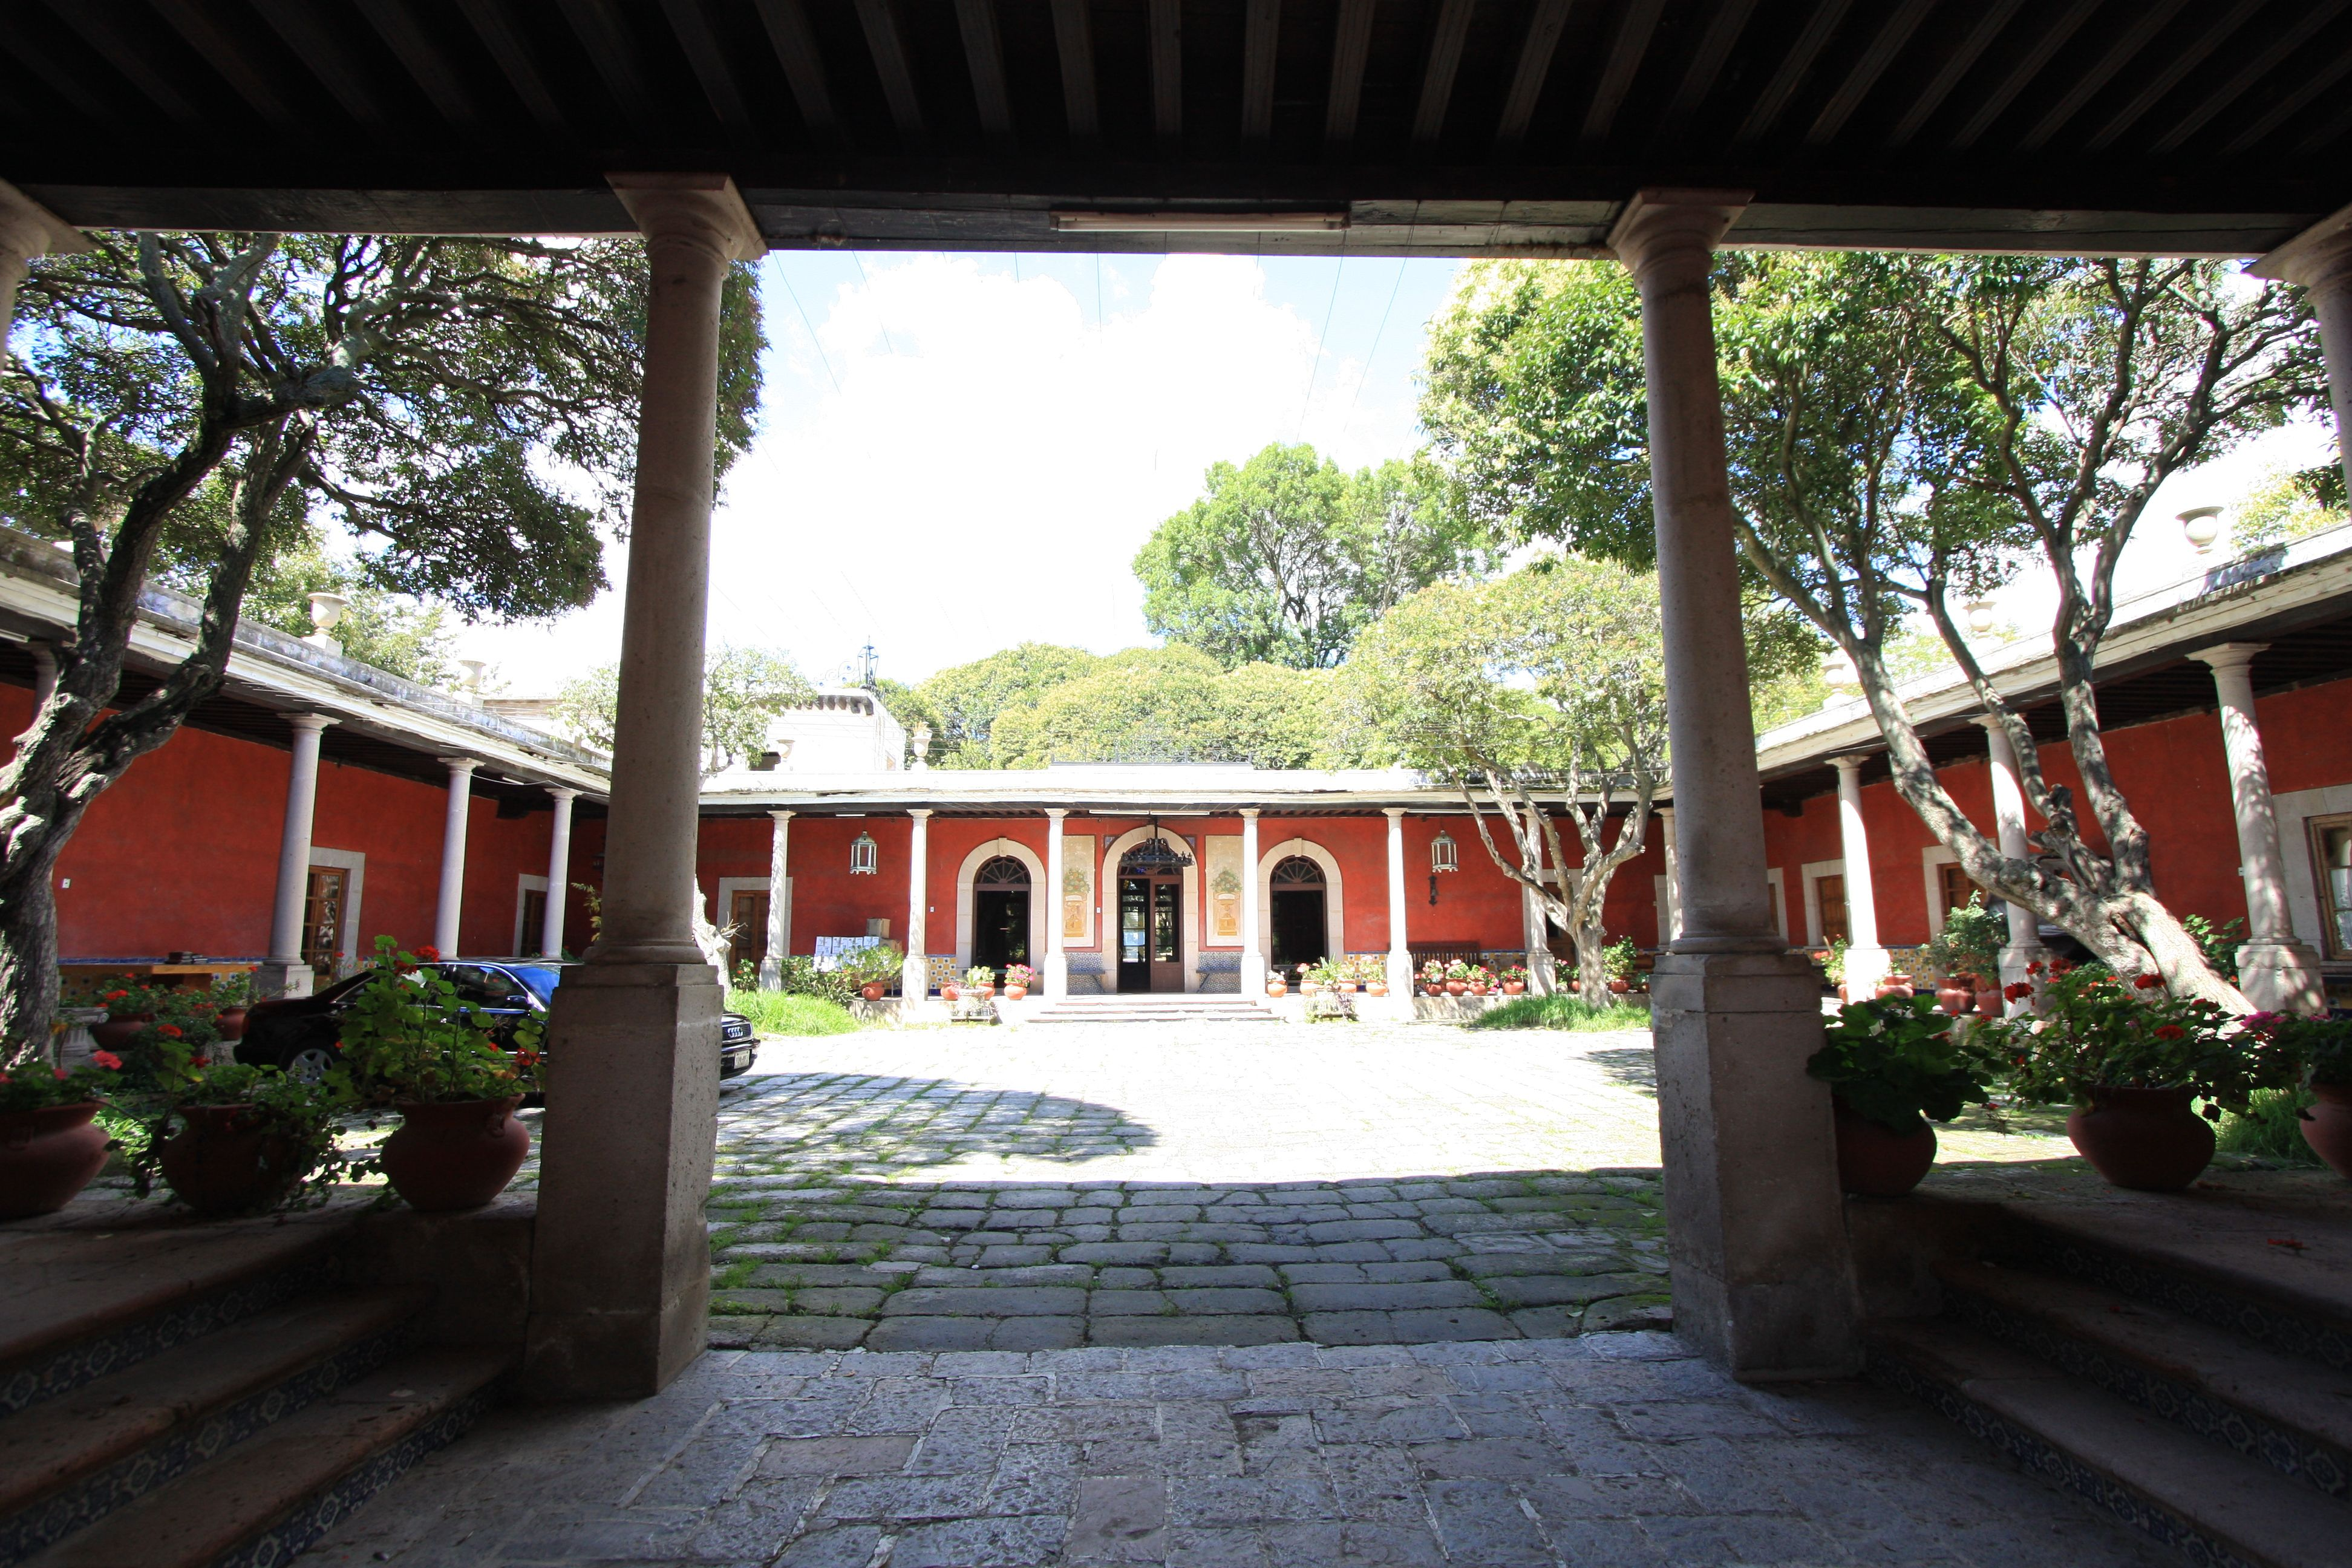 Hacienda Courtyards 11 Photo Gallery New in